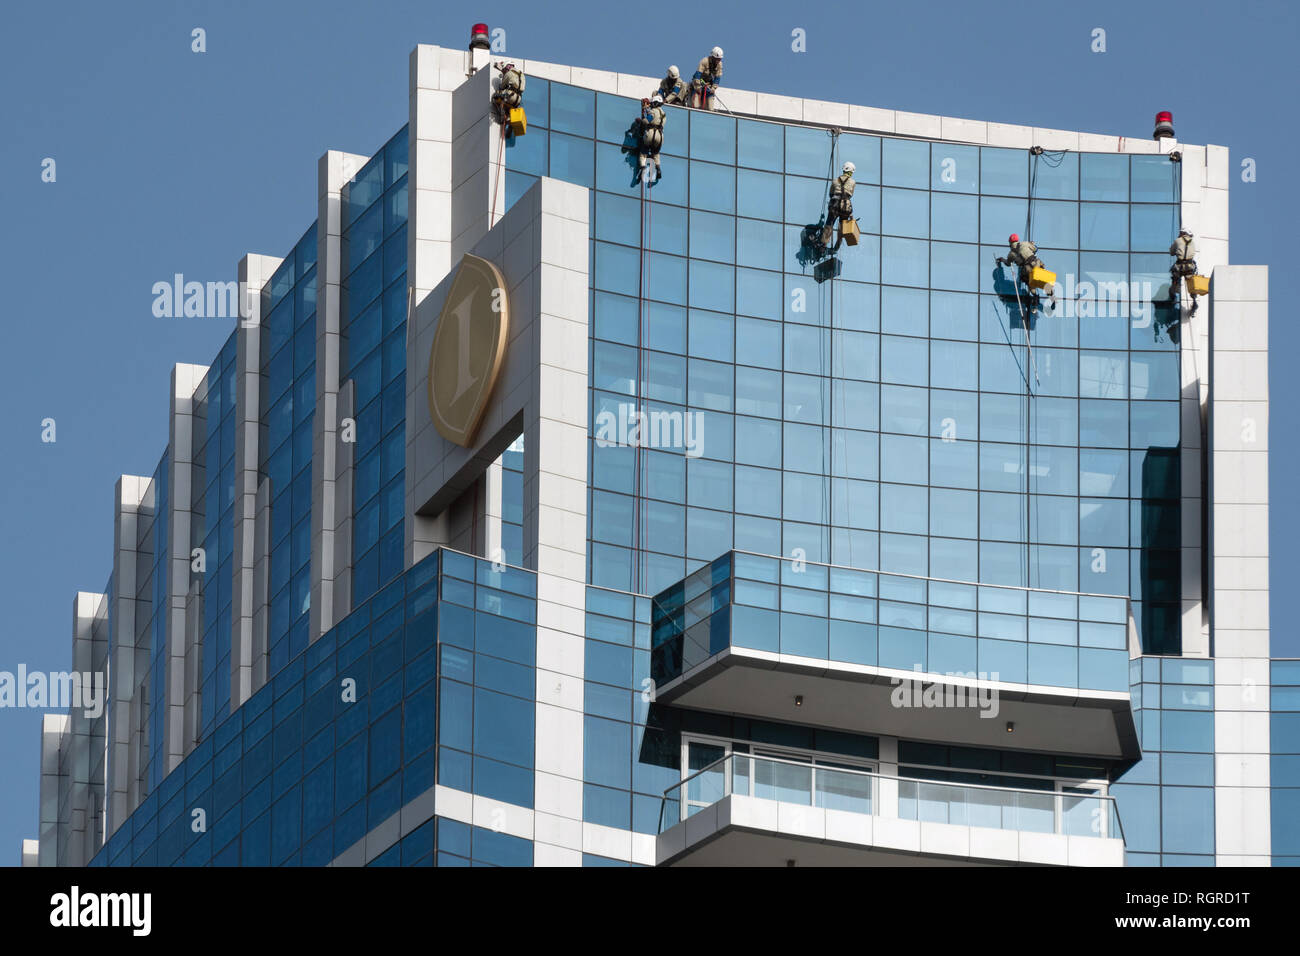 DUBAI, EMIRATOS ÁRABES UNIDOS - 15 de febrero de 2018, hombres: Limpiar la fachada del rascacielos moderno en Dubai, Emiratos Árabes Unidos. Foto de stock